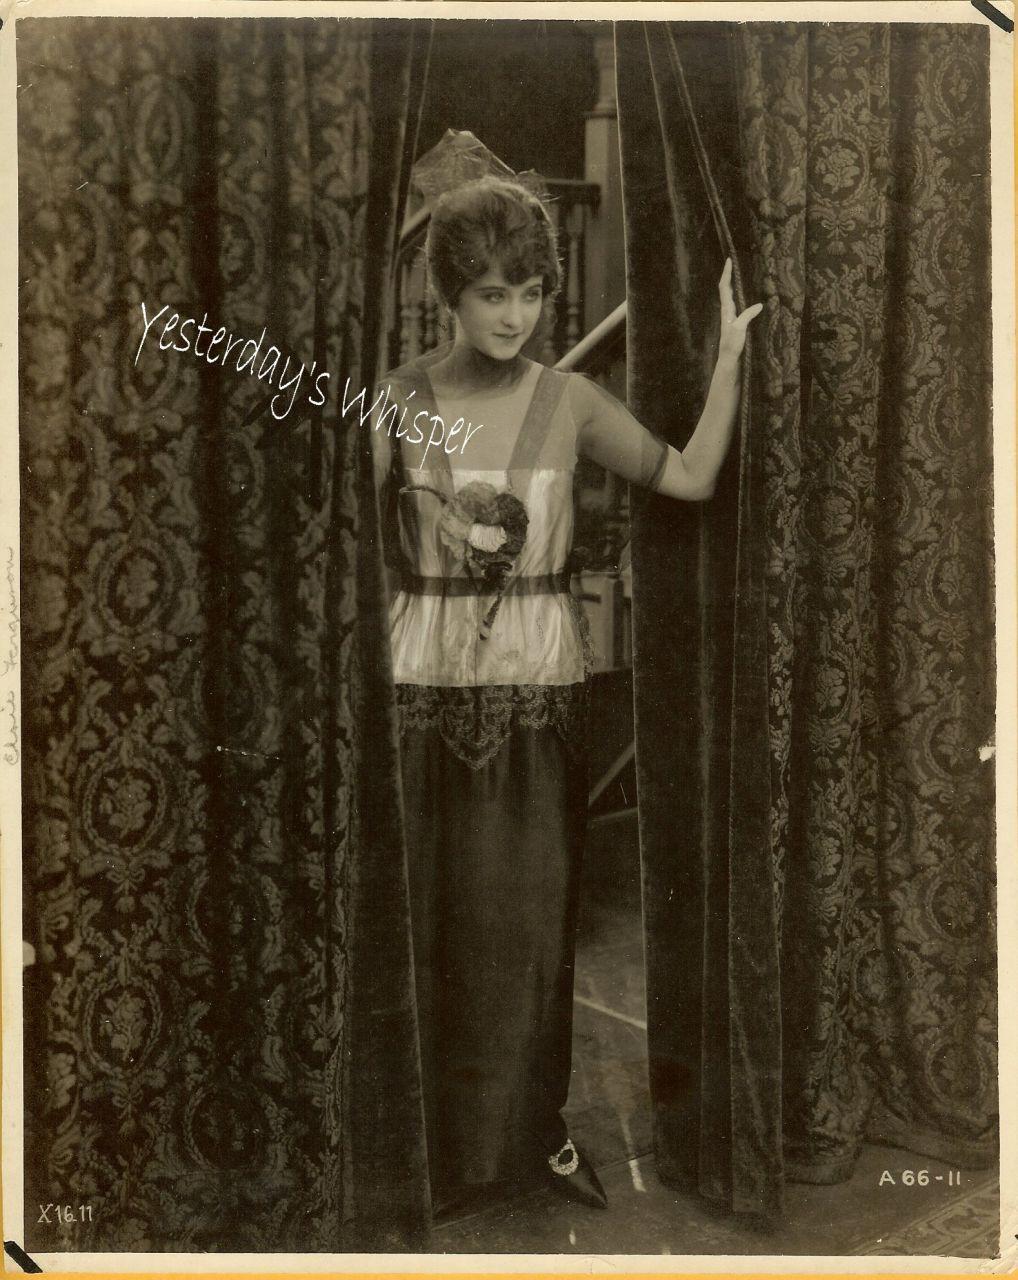 Elsie Ferguson c.1919 Photo Magnifcent Period Dress